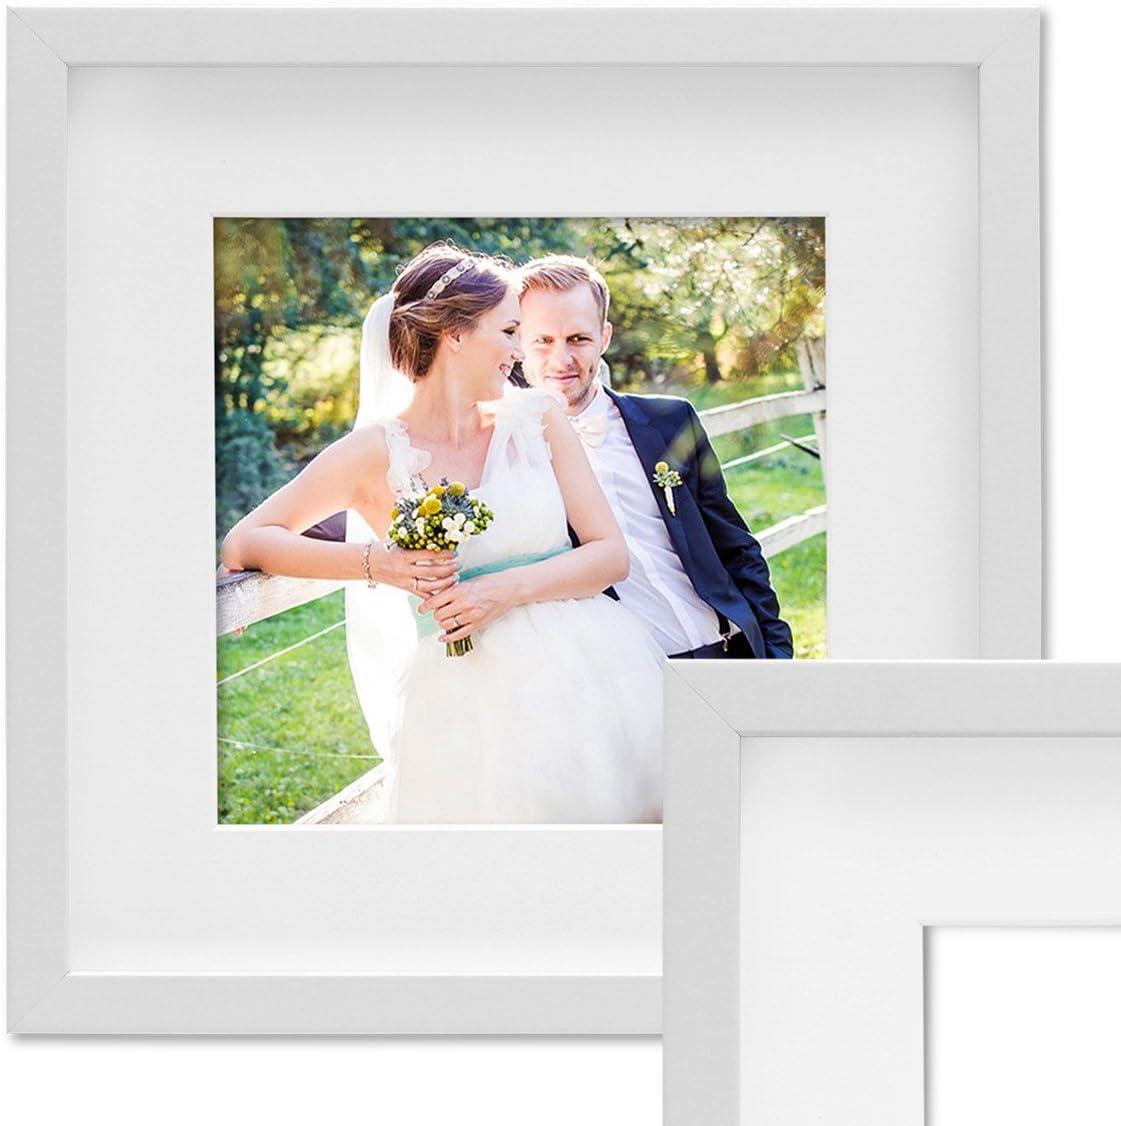 PHOTOLINI 3D-Bilderrahmen 30x30cm, Weiß